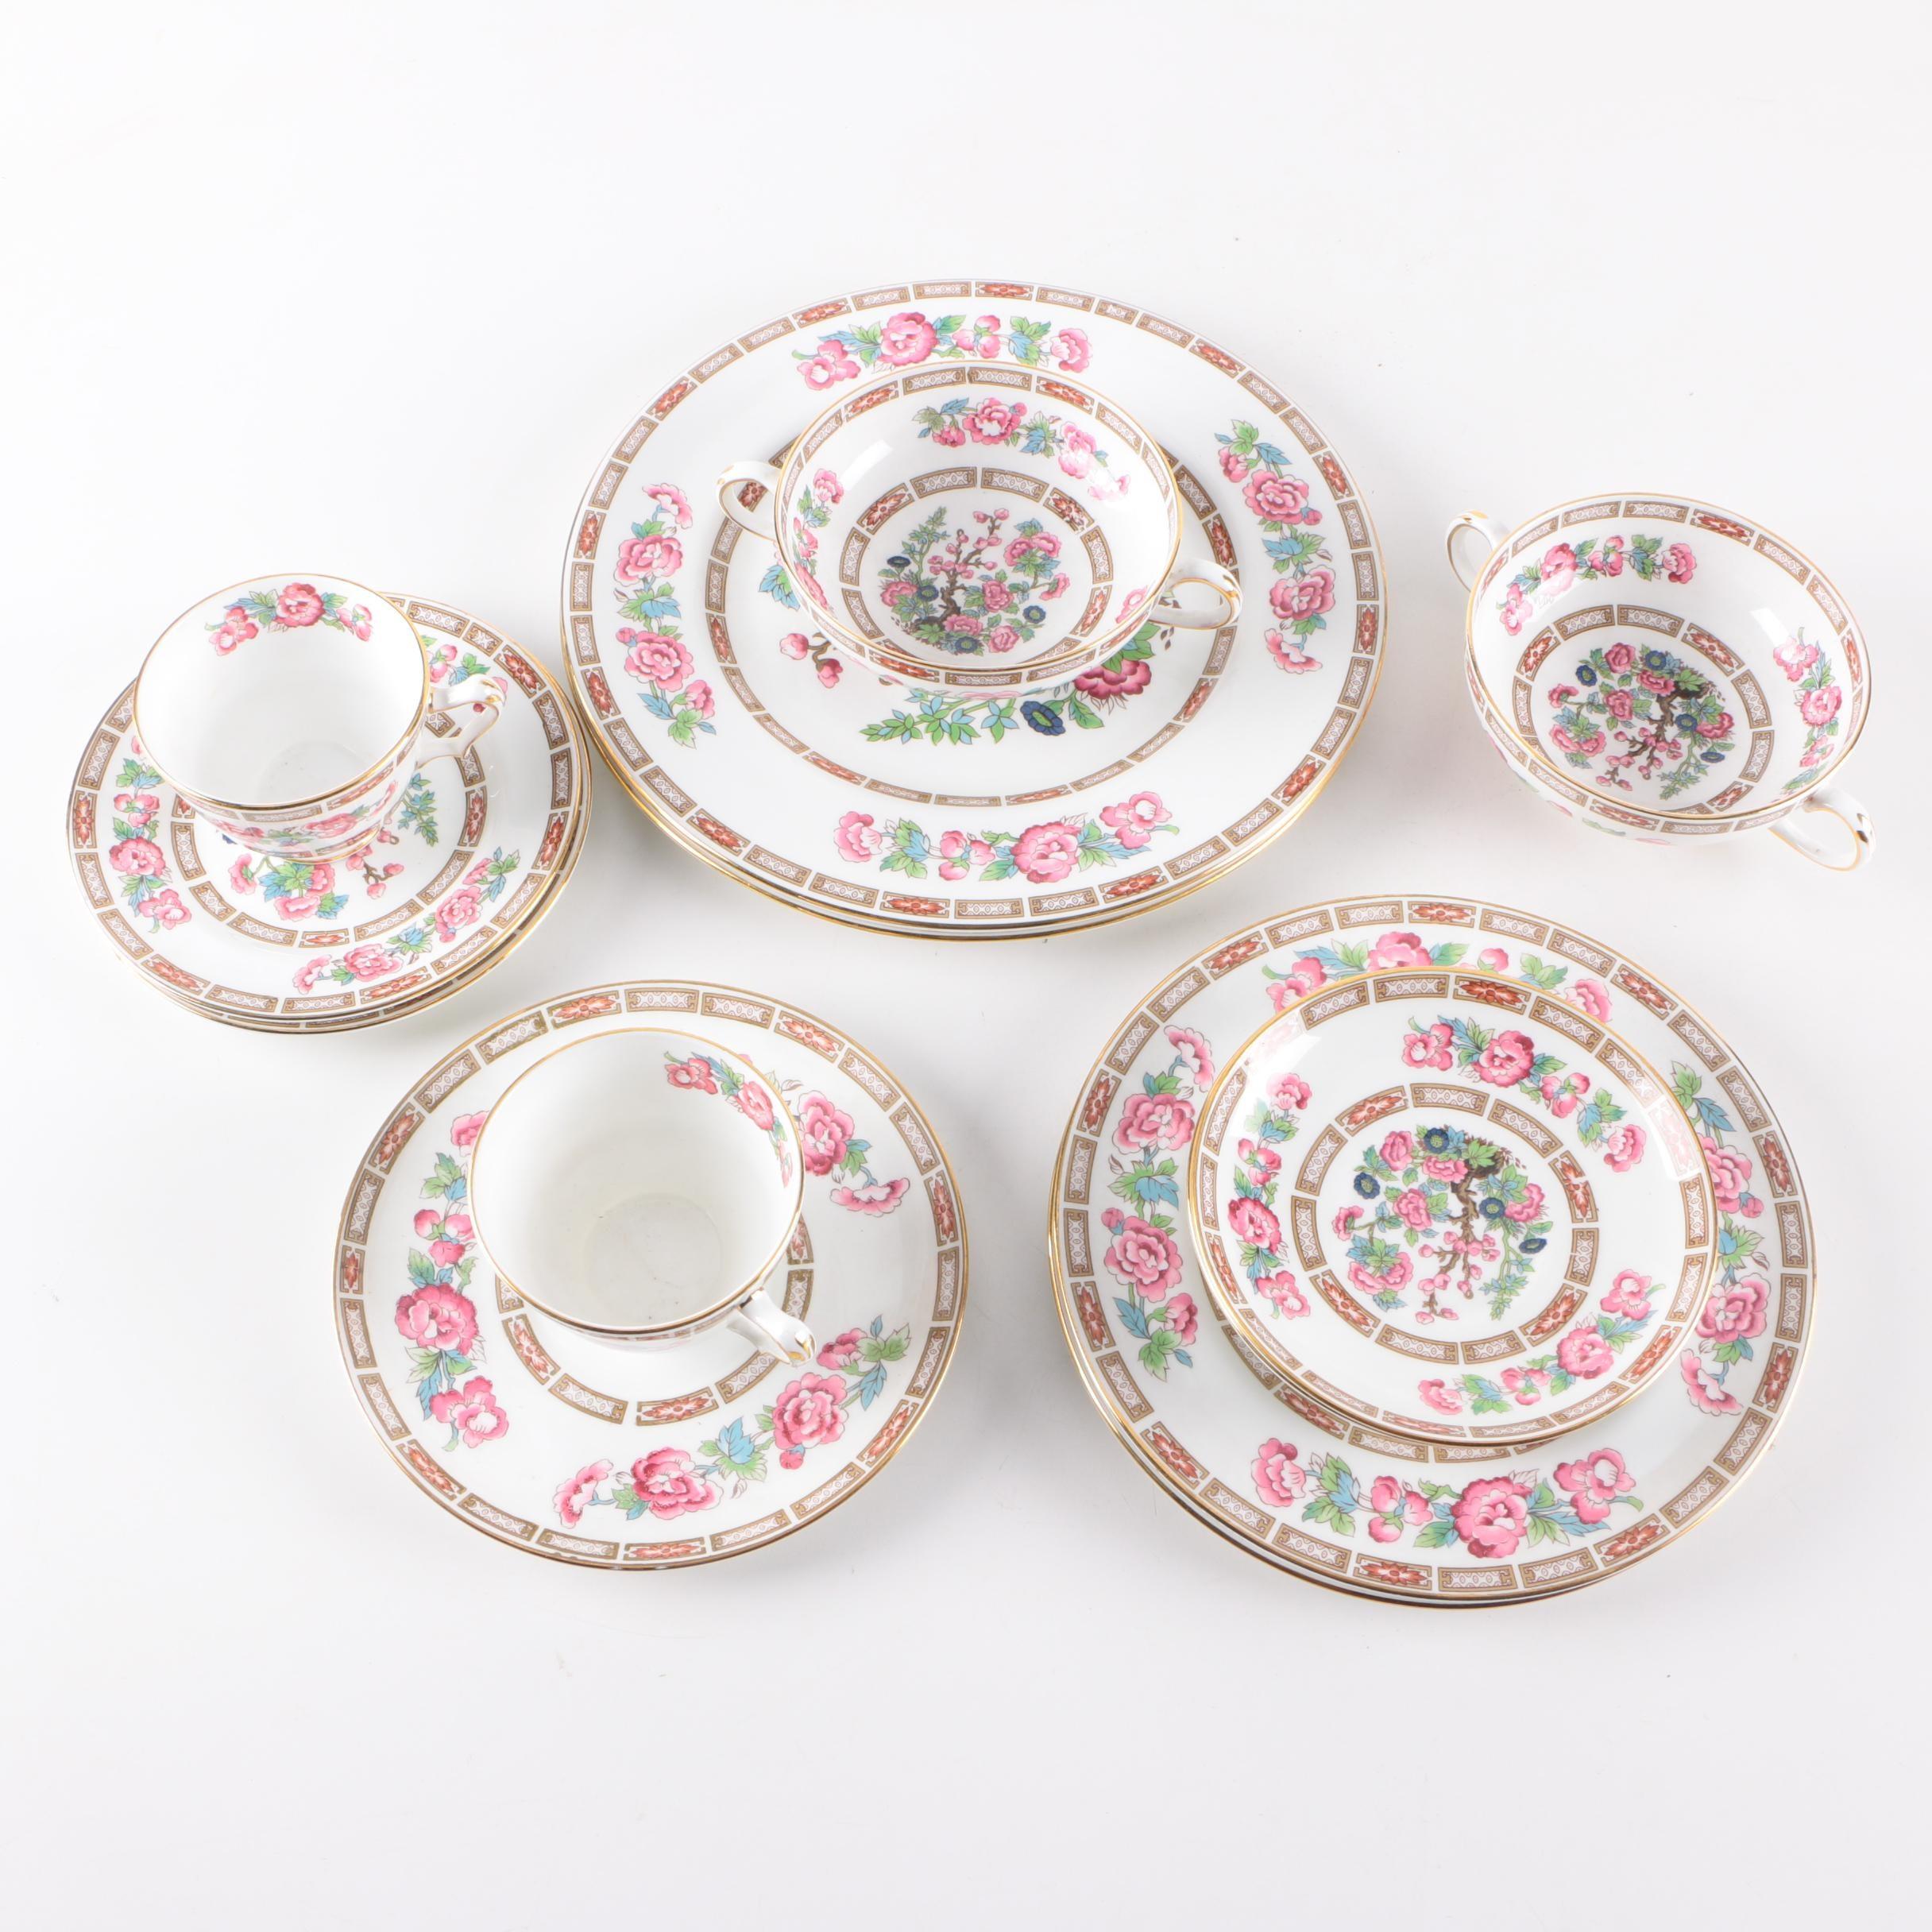 Mid-Century Crown Staffordshire Bone China Tableware